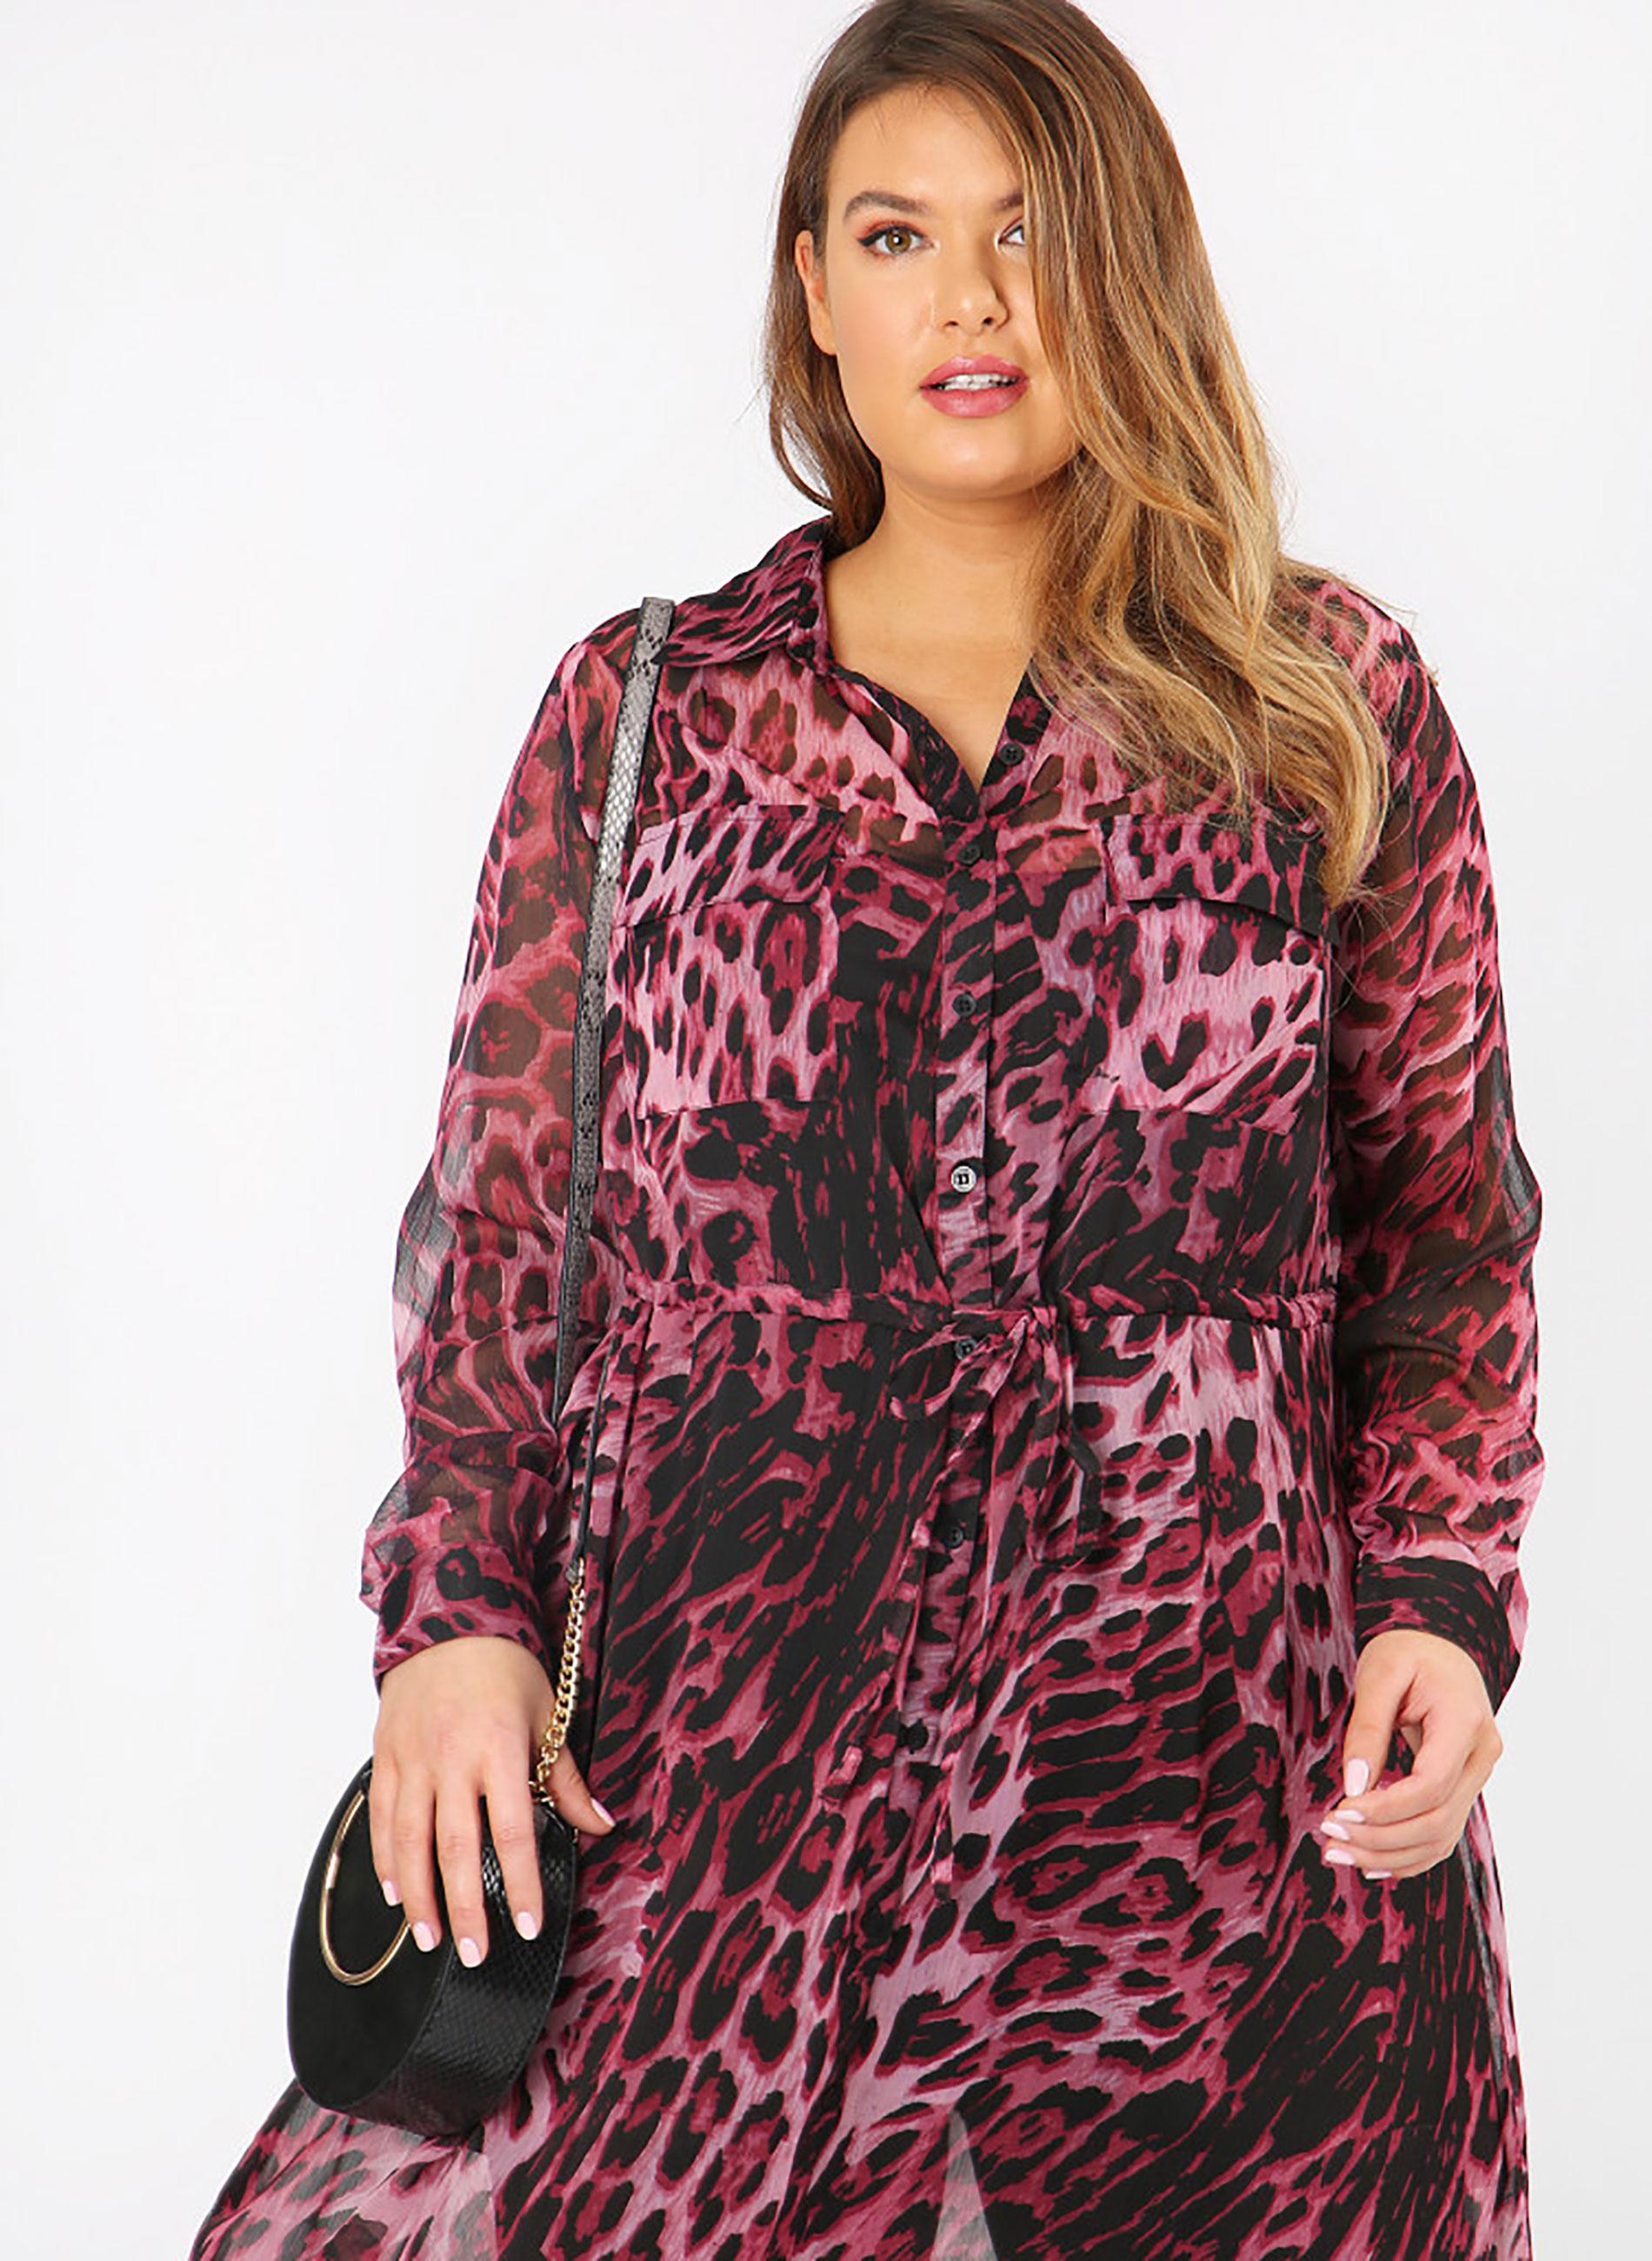 8322c98ad04d ΠΟΥΚΑΜΙΣΑ    Πουκάμισο Μακρύ Διαφανές Ροζ Leopard - Μόδα σε μεγάλα ...